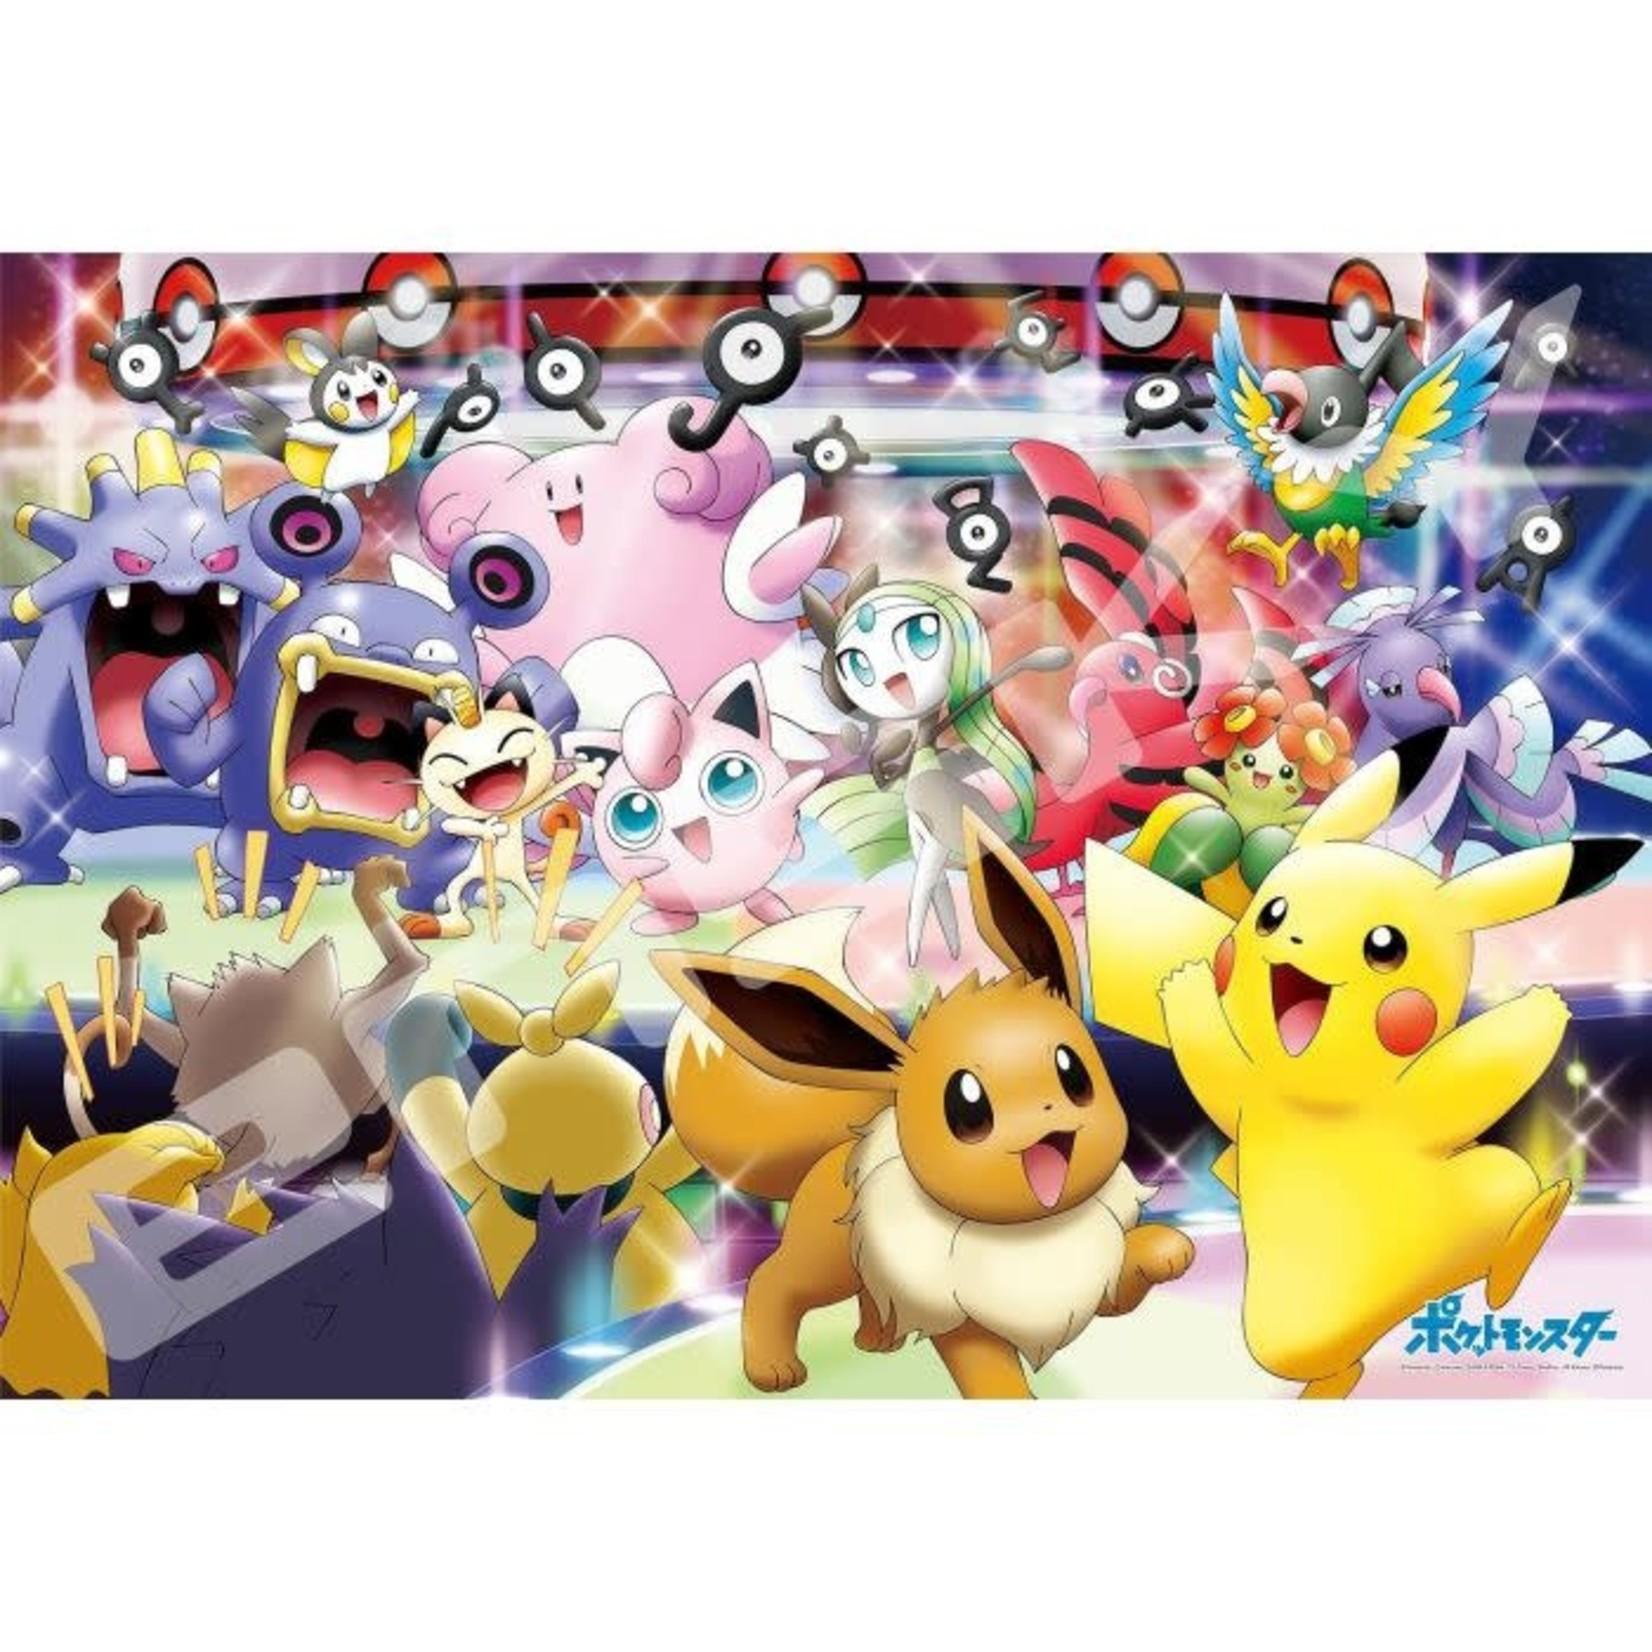 Pokemon: Exciting Concert 1000pcs puzzle